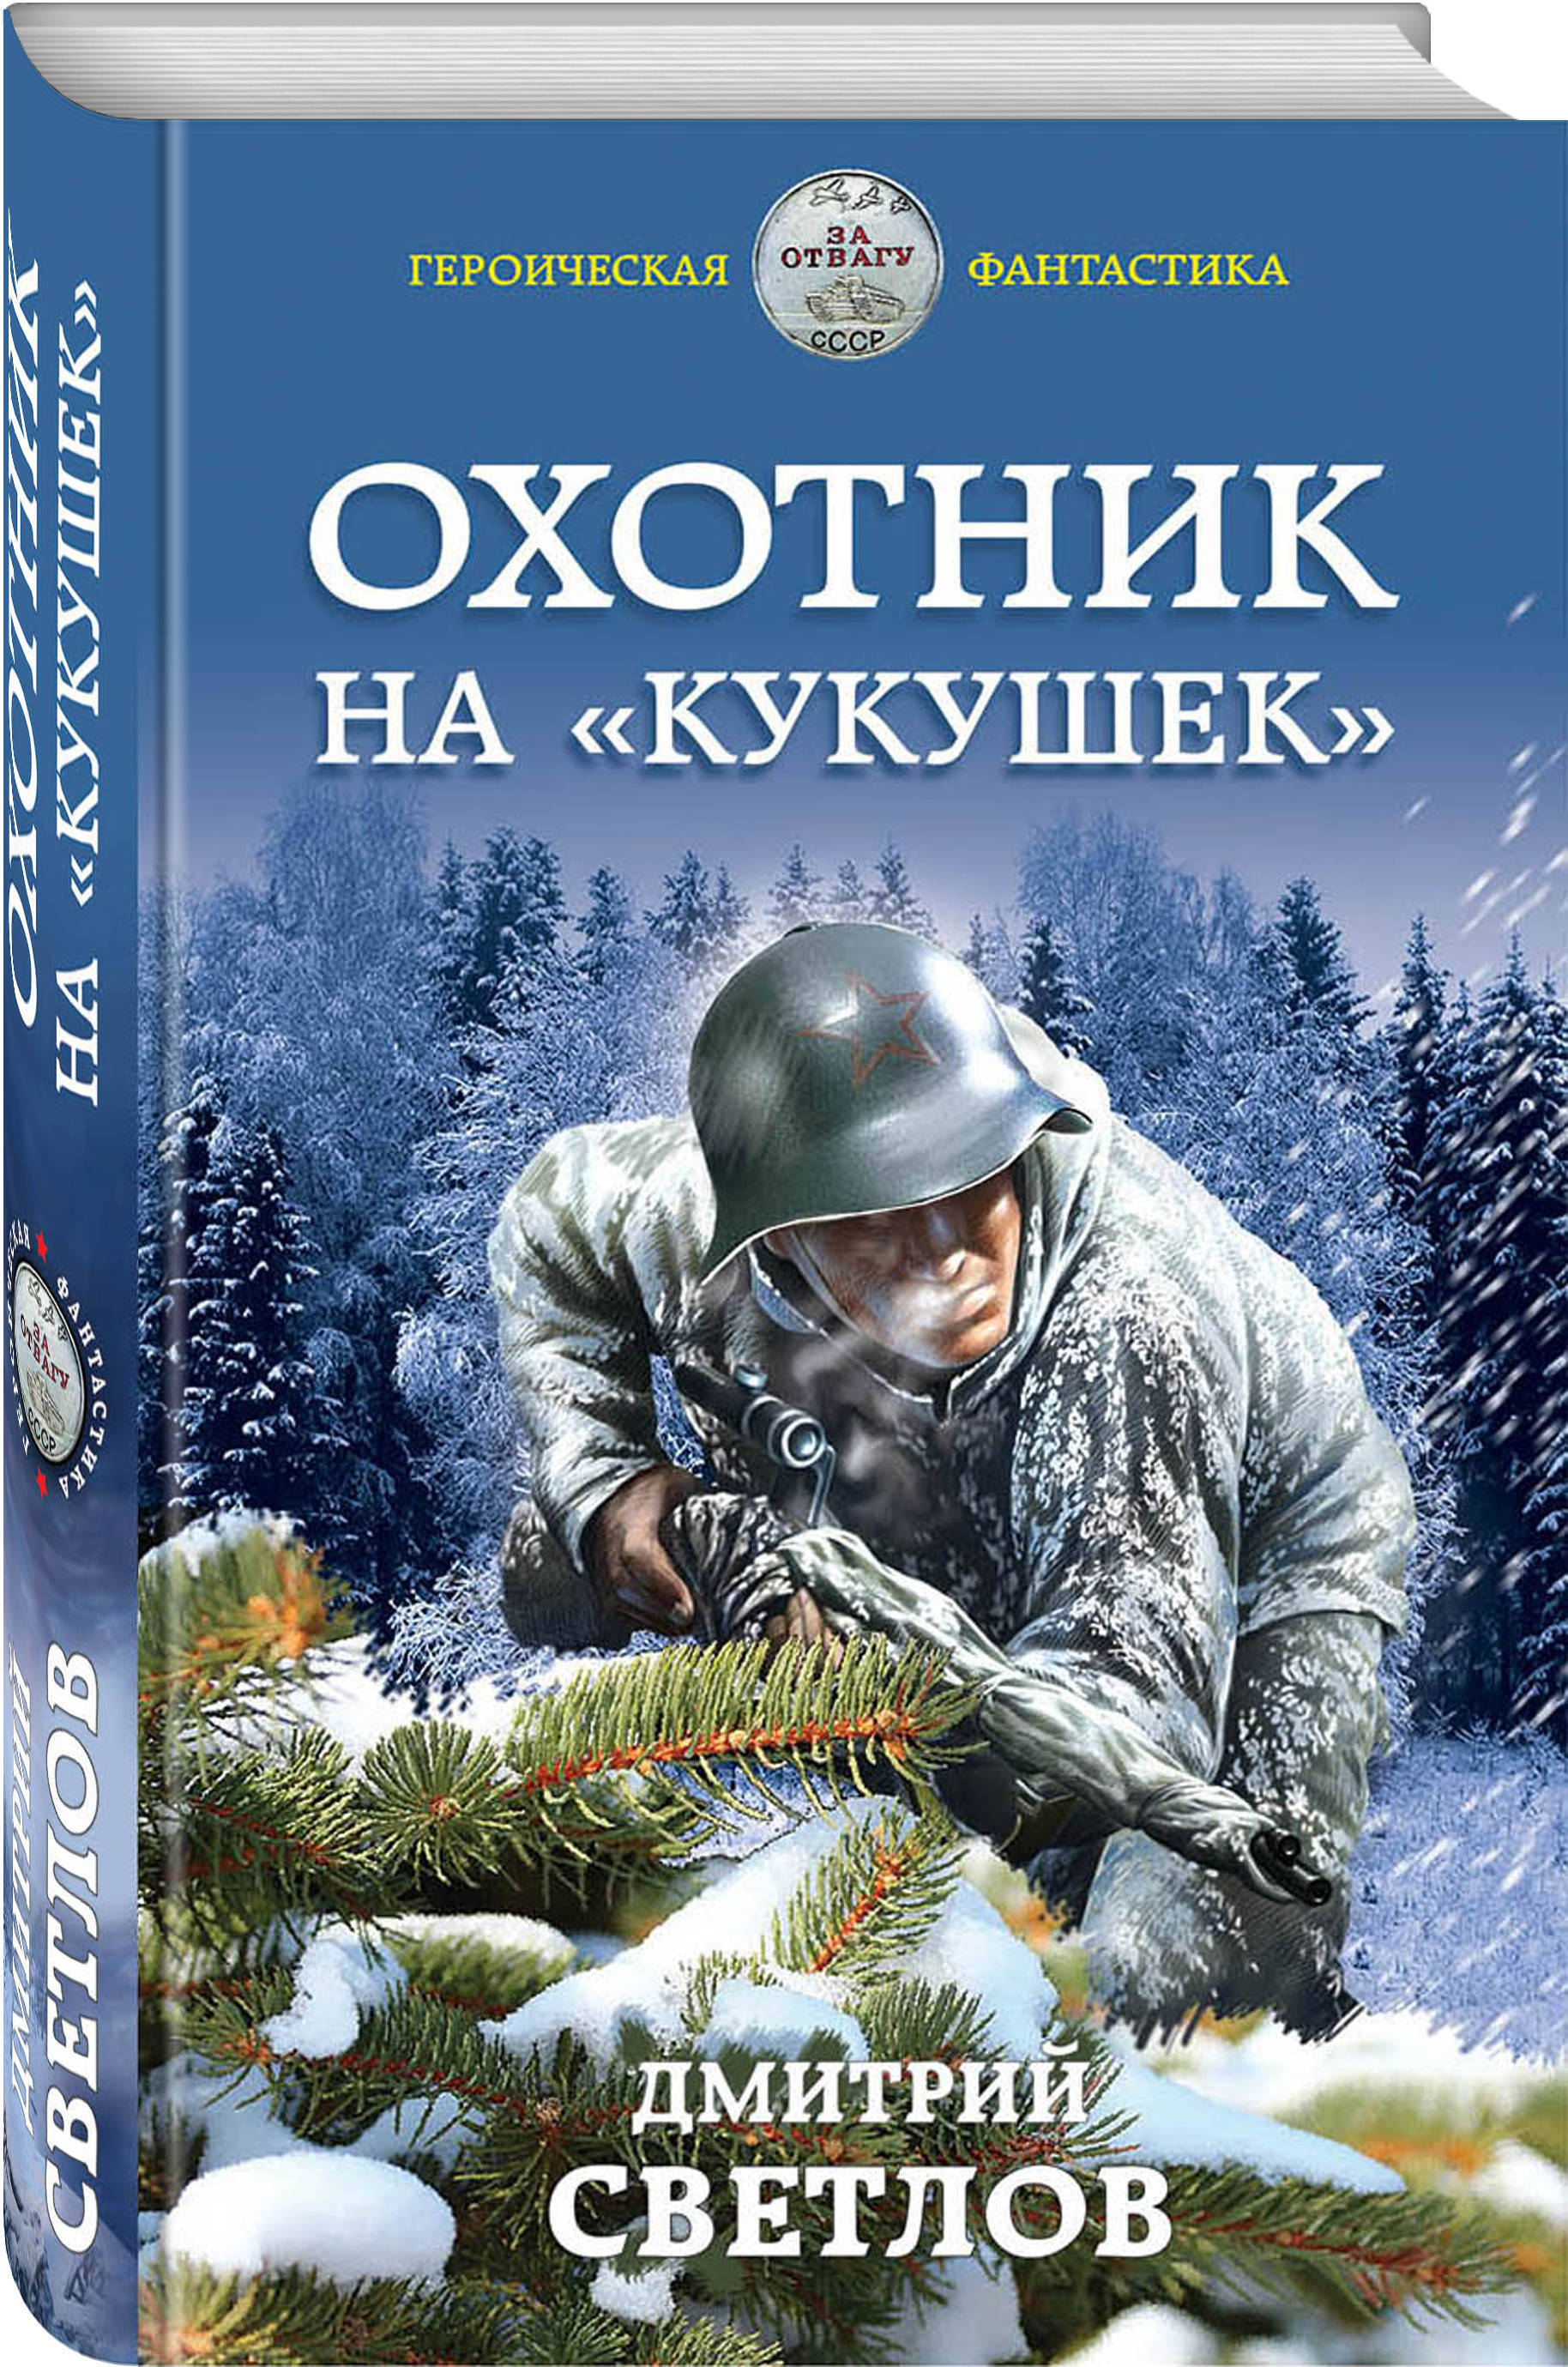 Охотник на «кукушек» | Светлов Дмитрий Николаевич